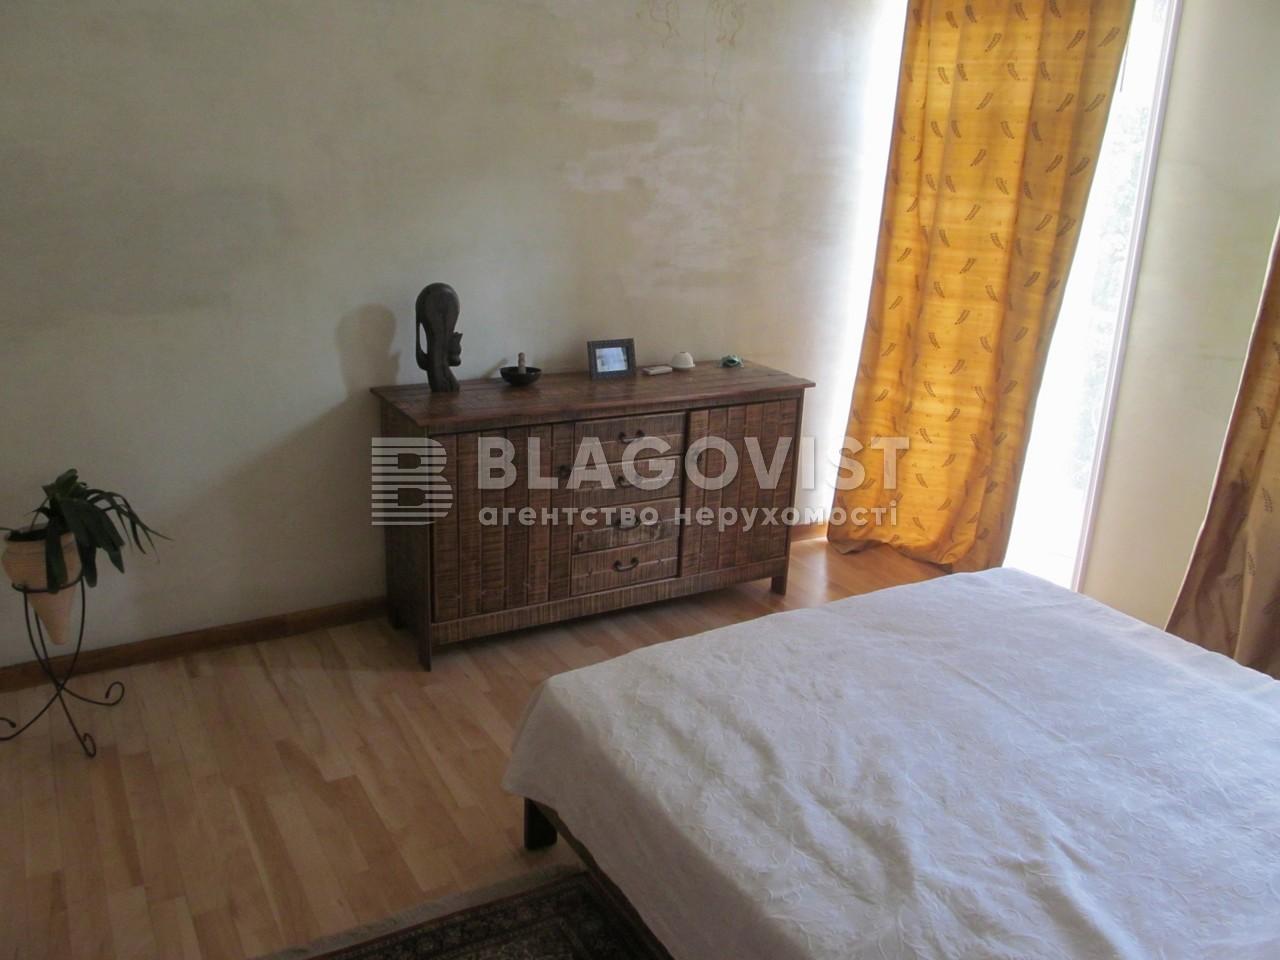 Квартира C-103021, Деловая (Димитрова), 13, Киев - Фото 7